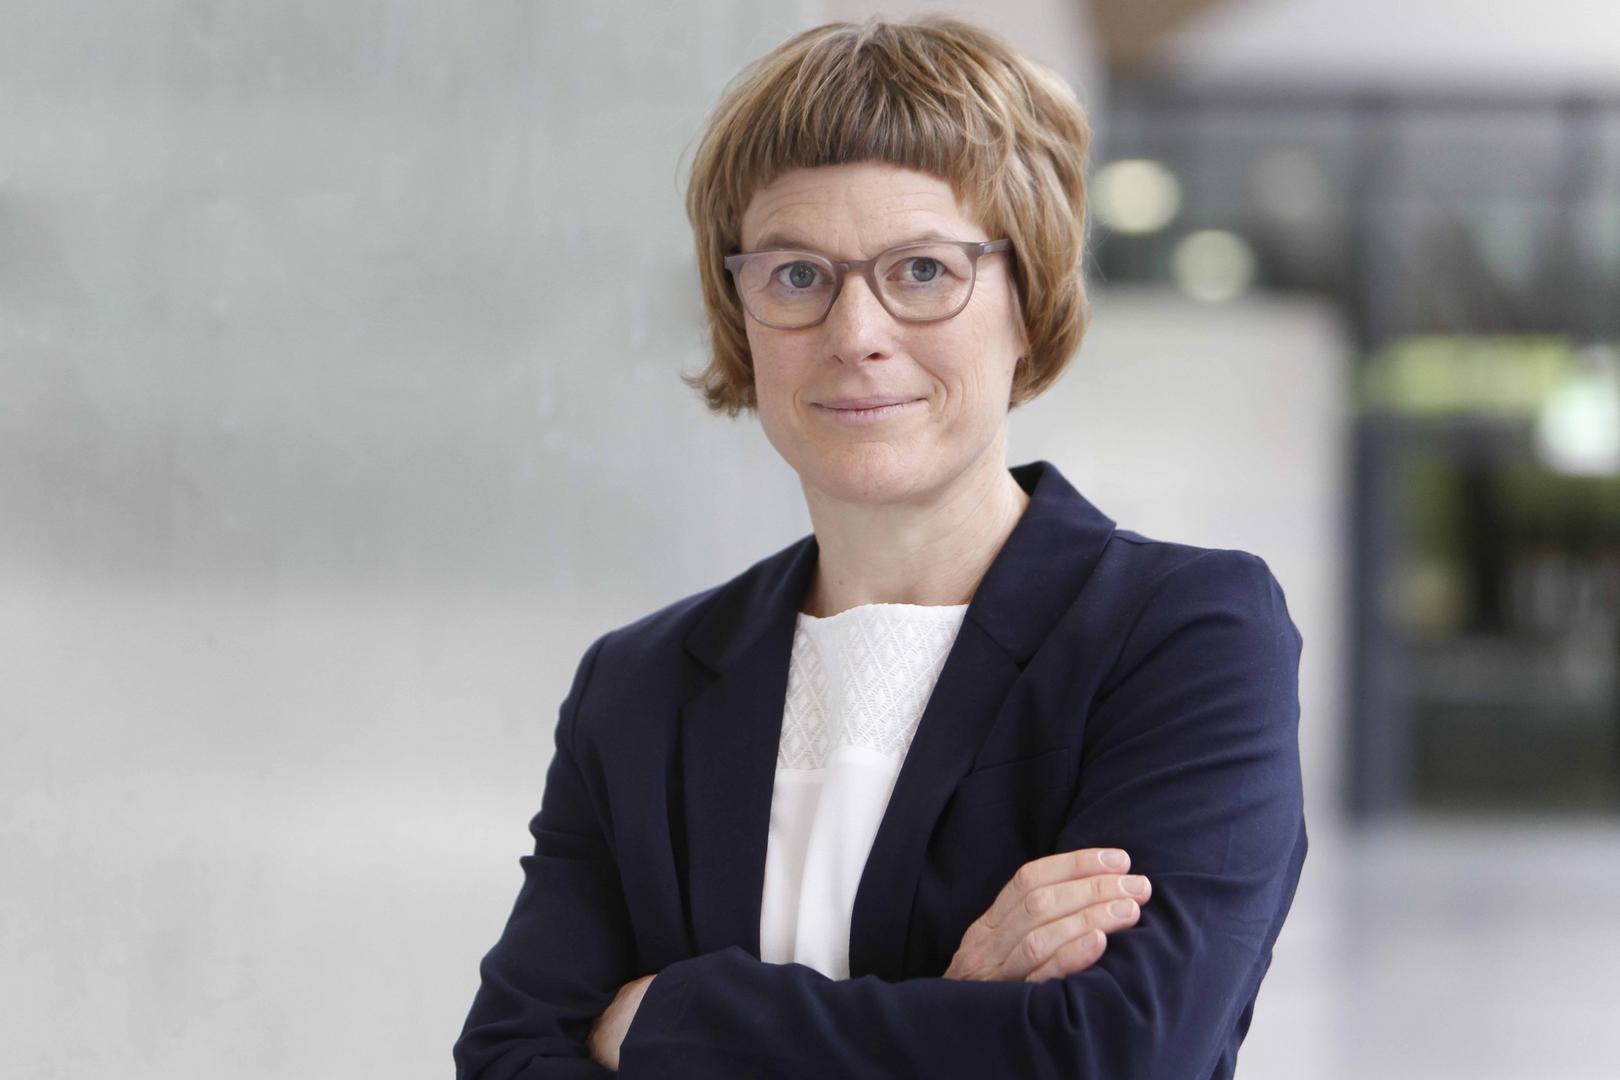 Dr Grimm Kiel